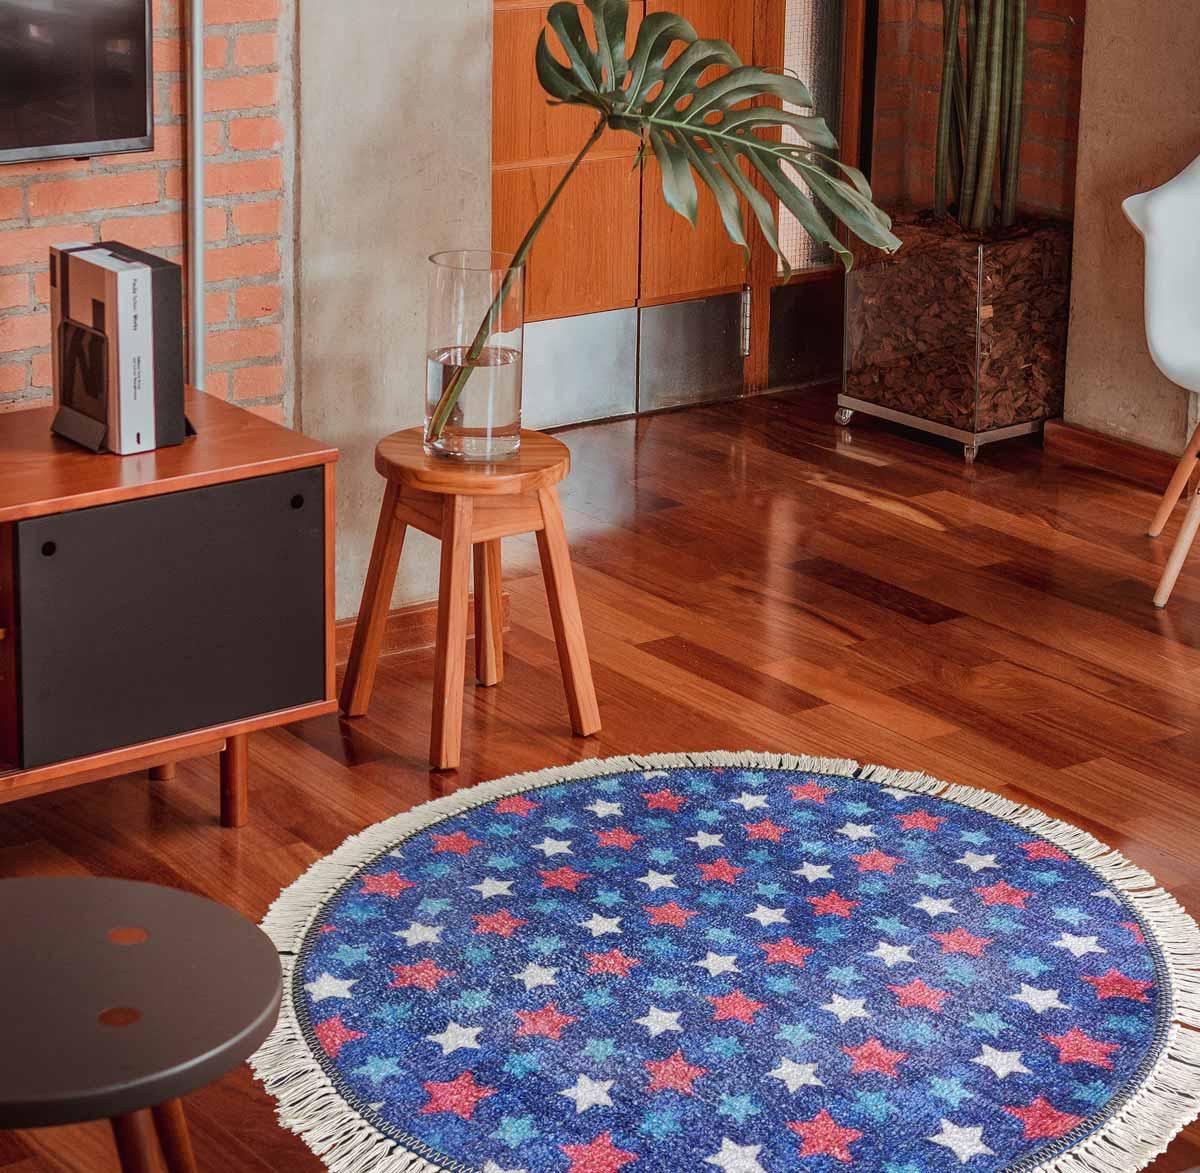 Picture of: Avioni Carpet For Kids Room Round Rug Blue Stars